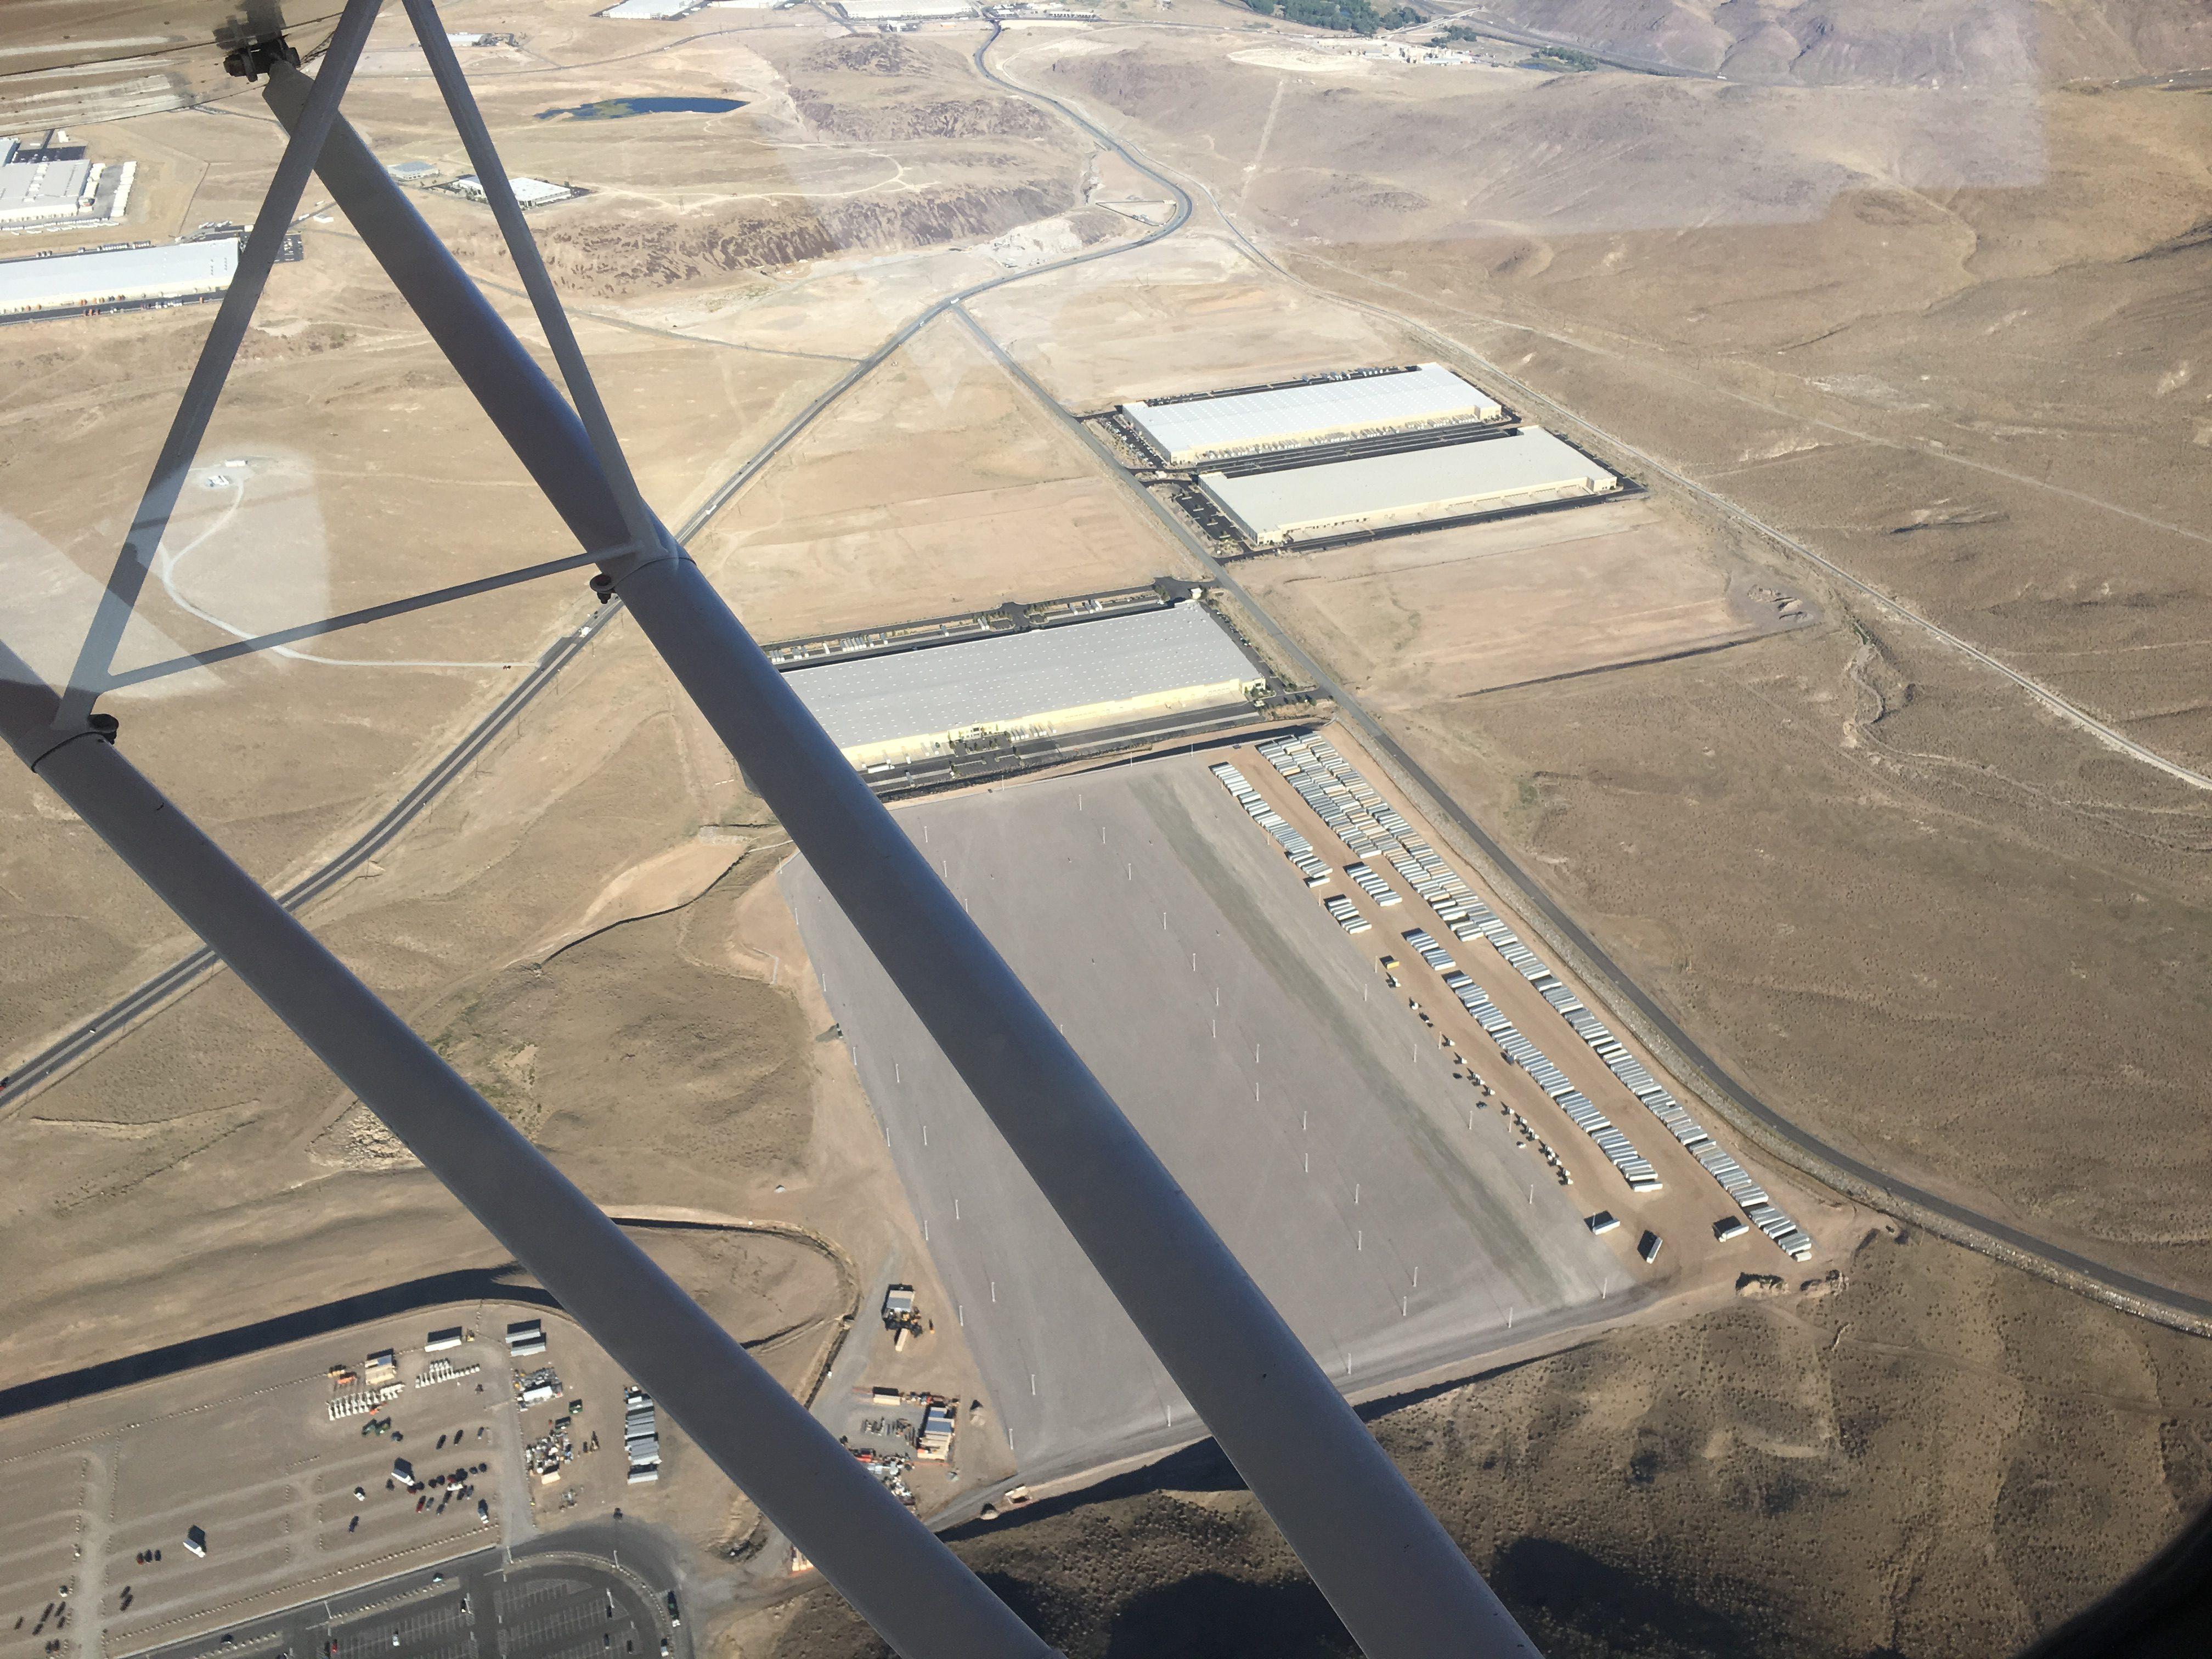 tesla-gigafactory-solar-array-aug-29-1